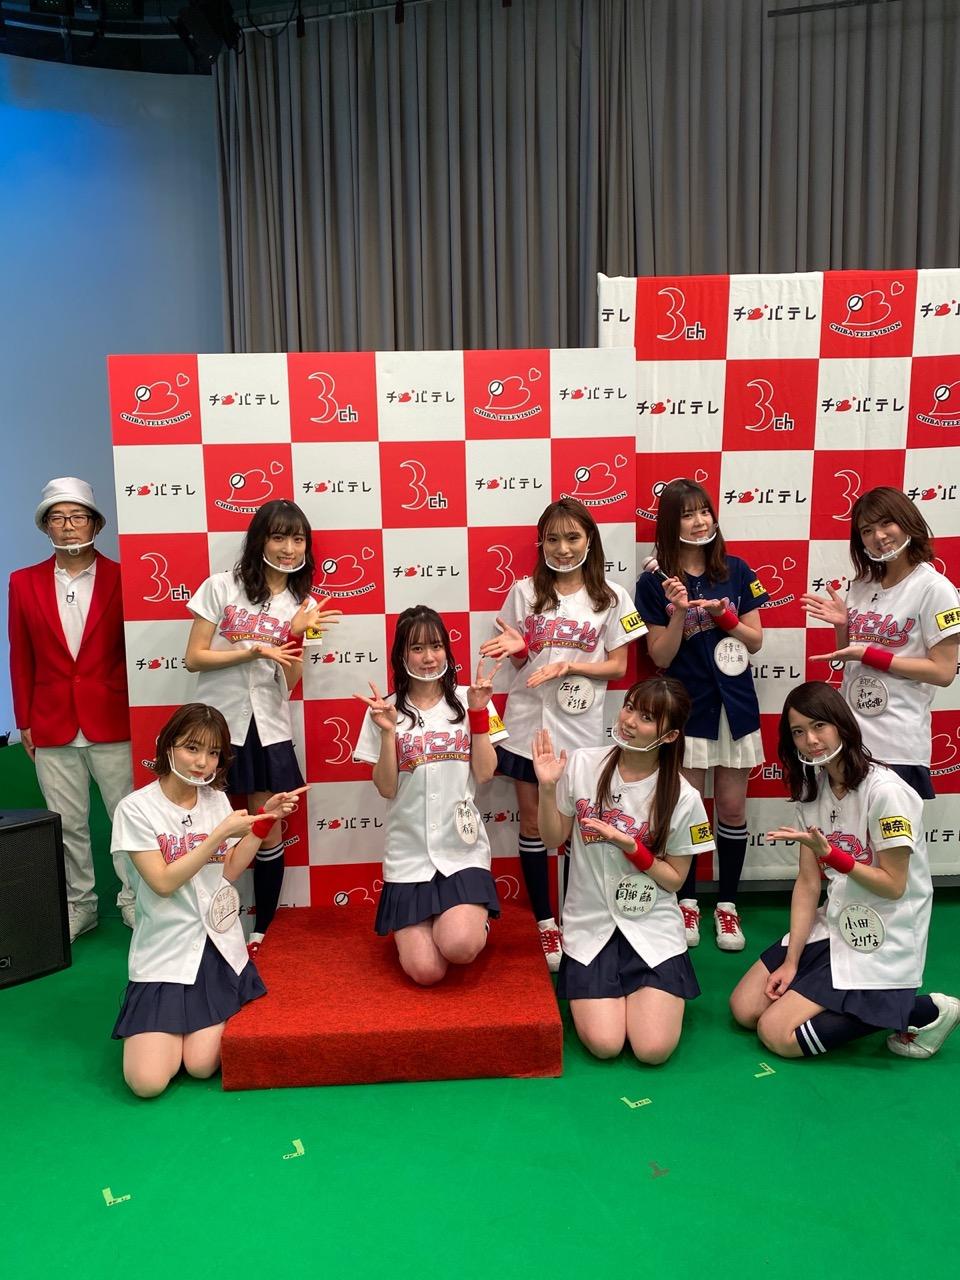 「AKB48チーム8のKANTO白書 バッチこーい!」#81:バッチバチ!あなたは服部有菜より賢いの?【チバテレ】